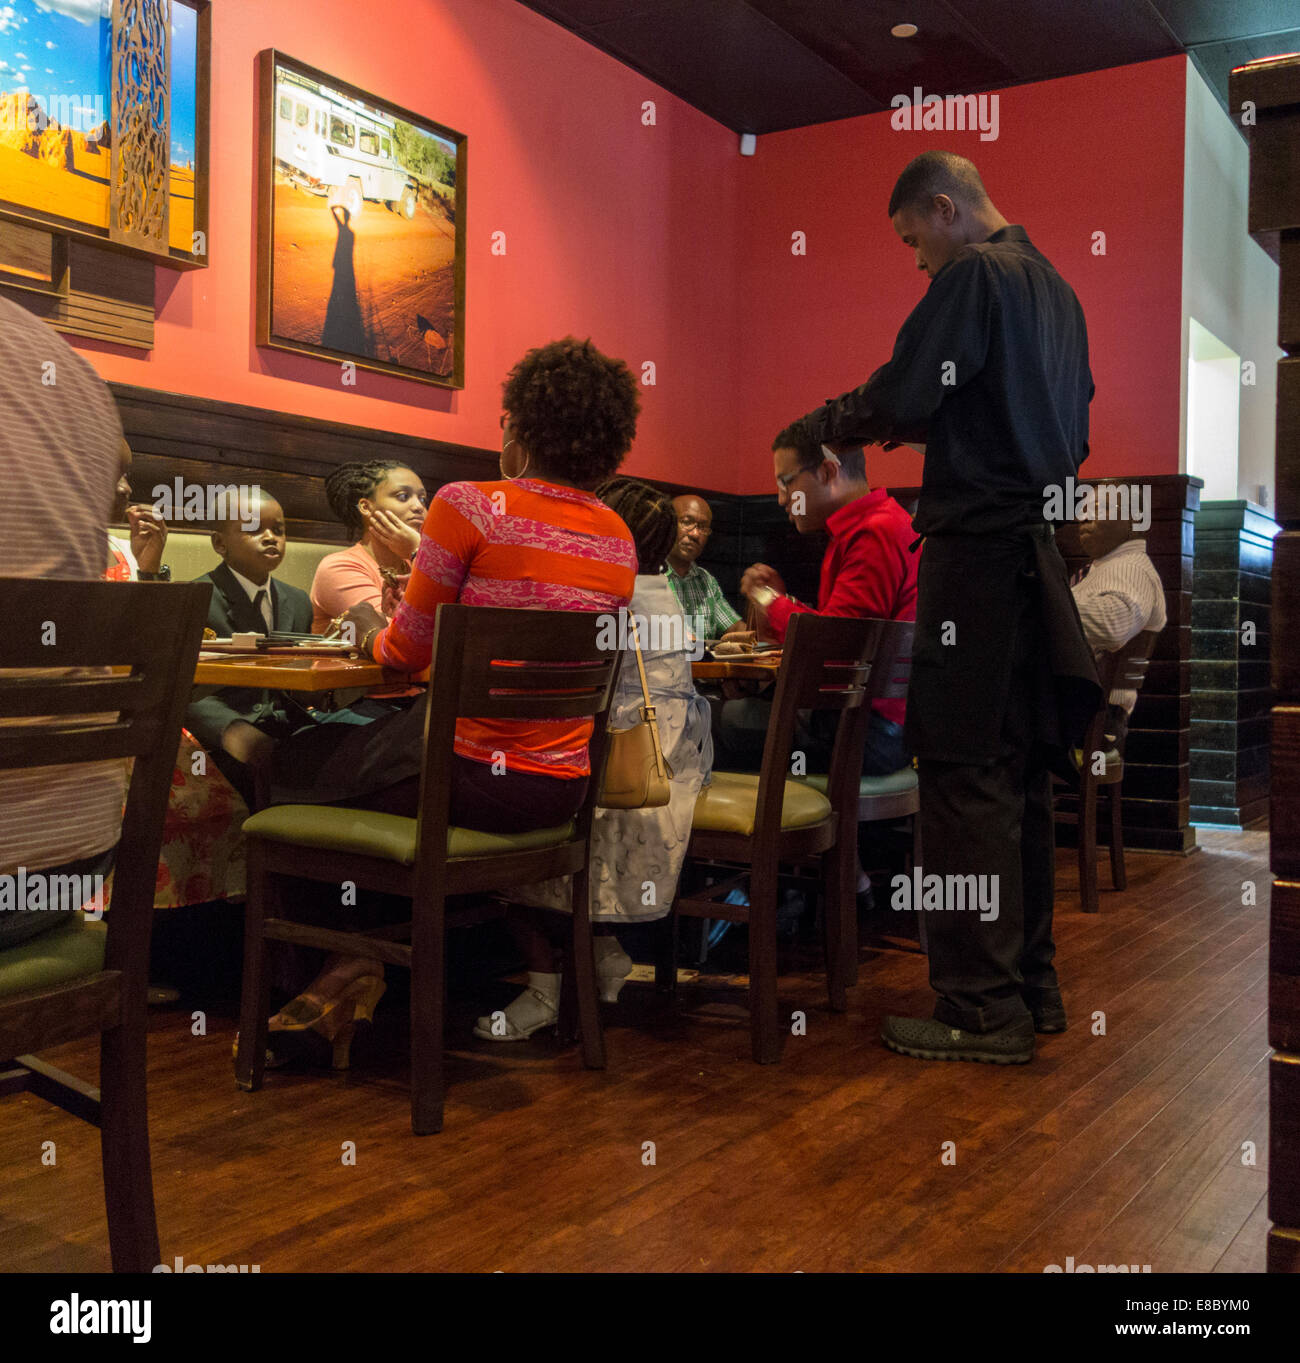 Cenas Familiares, Outback Steakhouse restaurante, Nassau, Las Bahamas Imagen De Stock